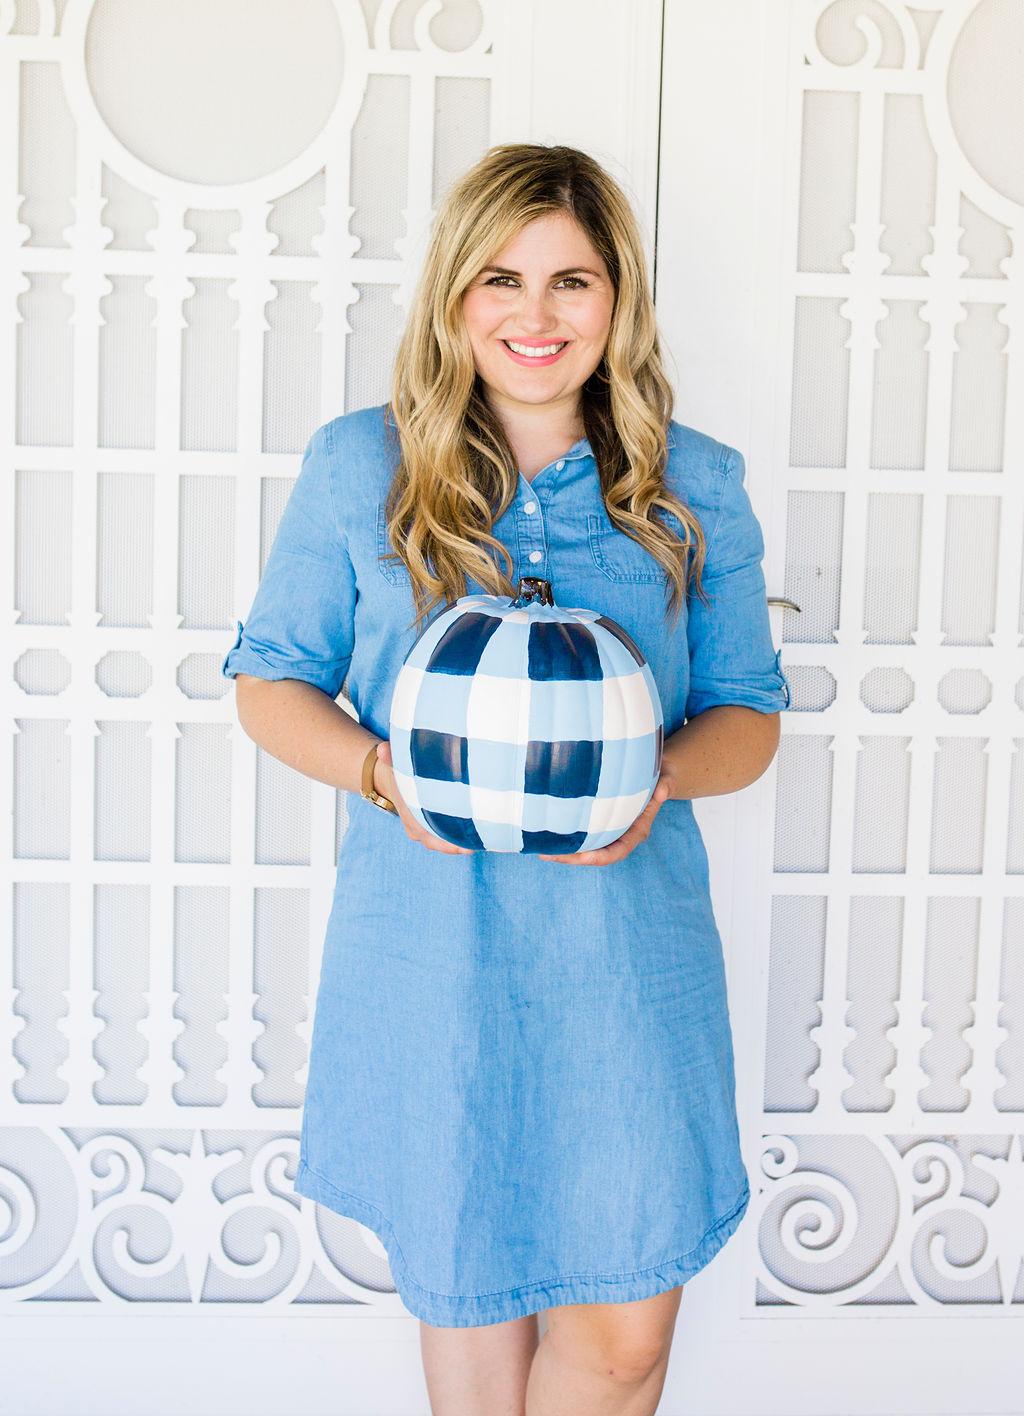 wearing a blue dress